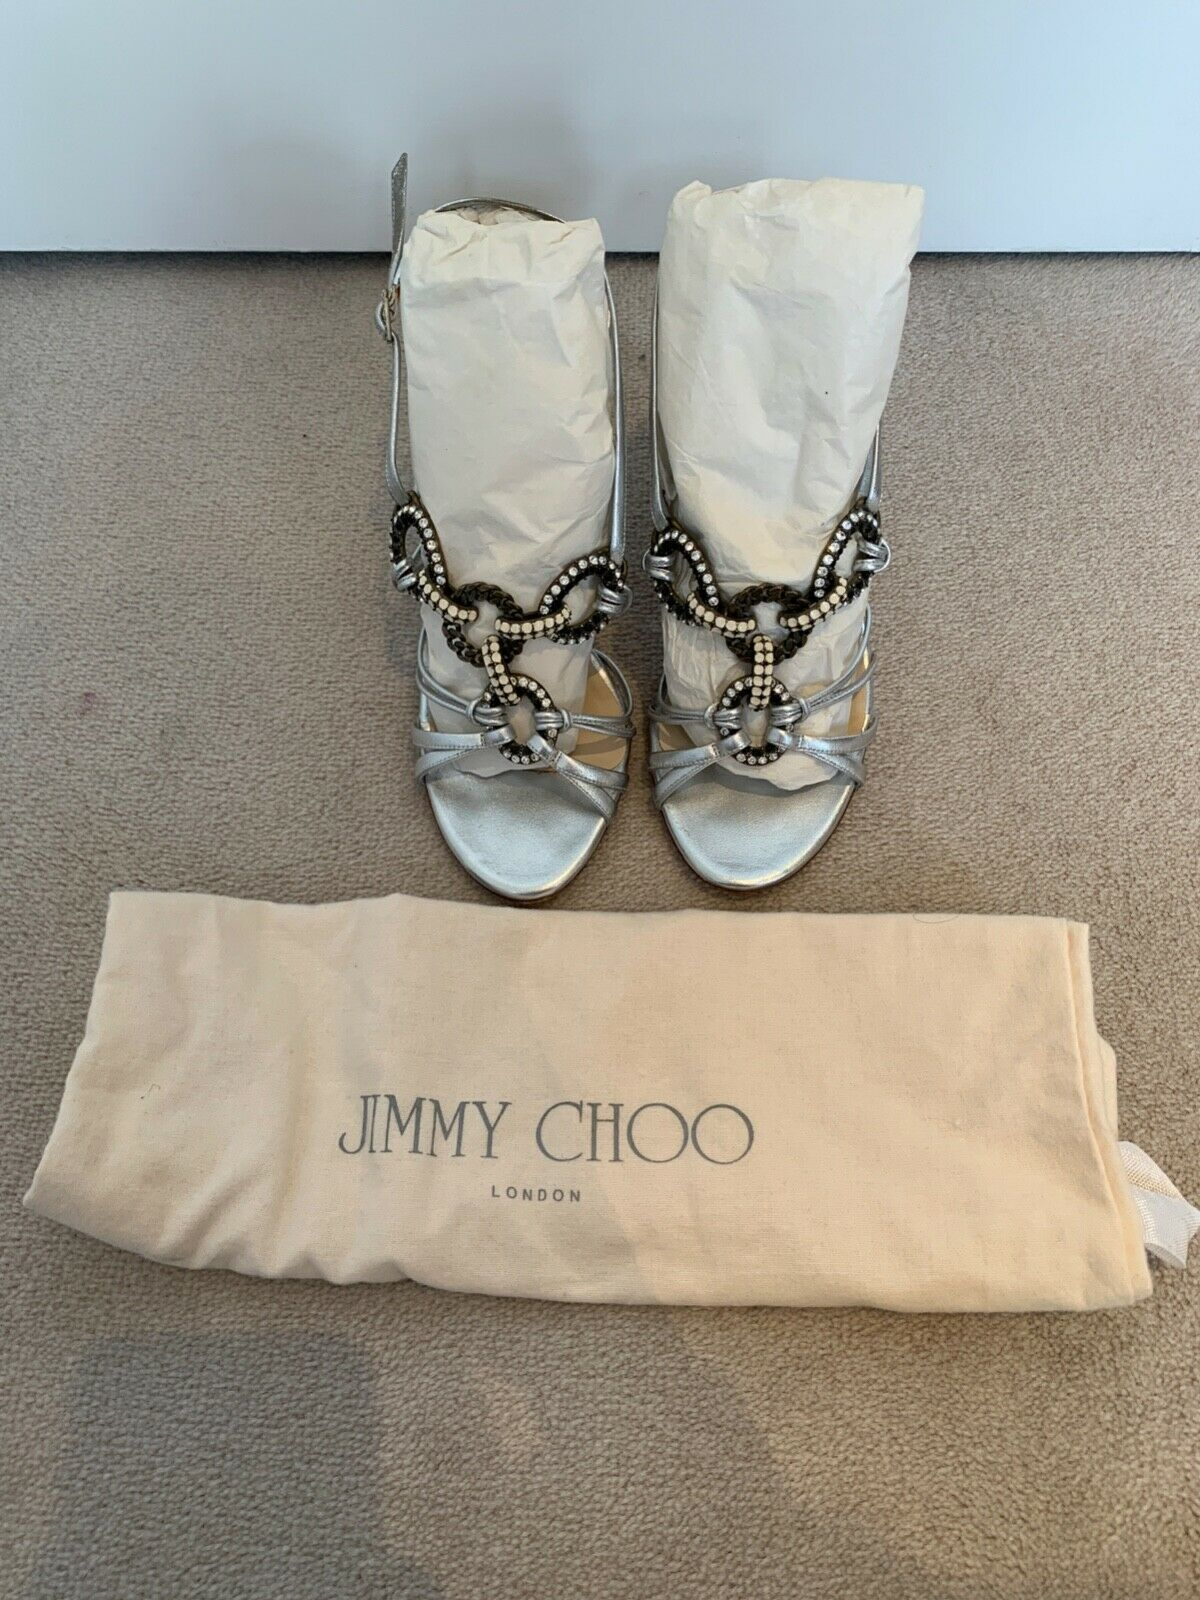 Jimmy Choo Silver Embellished Heeled Sandals